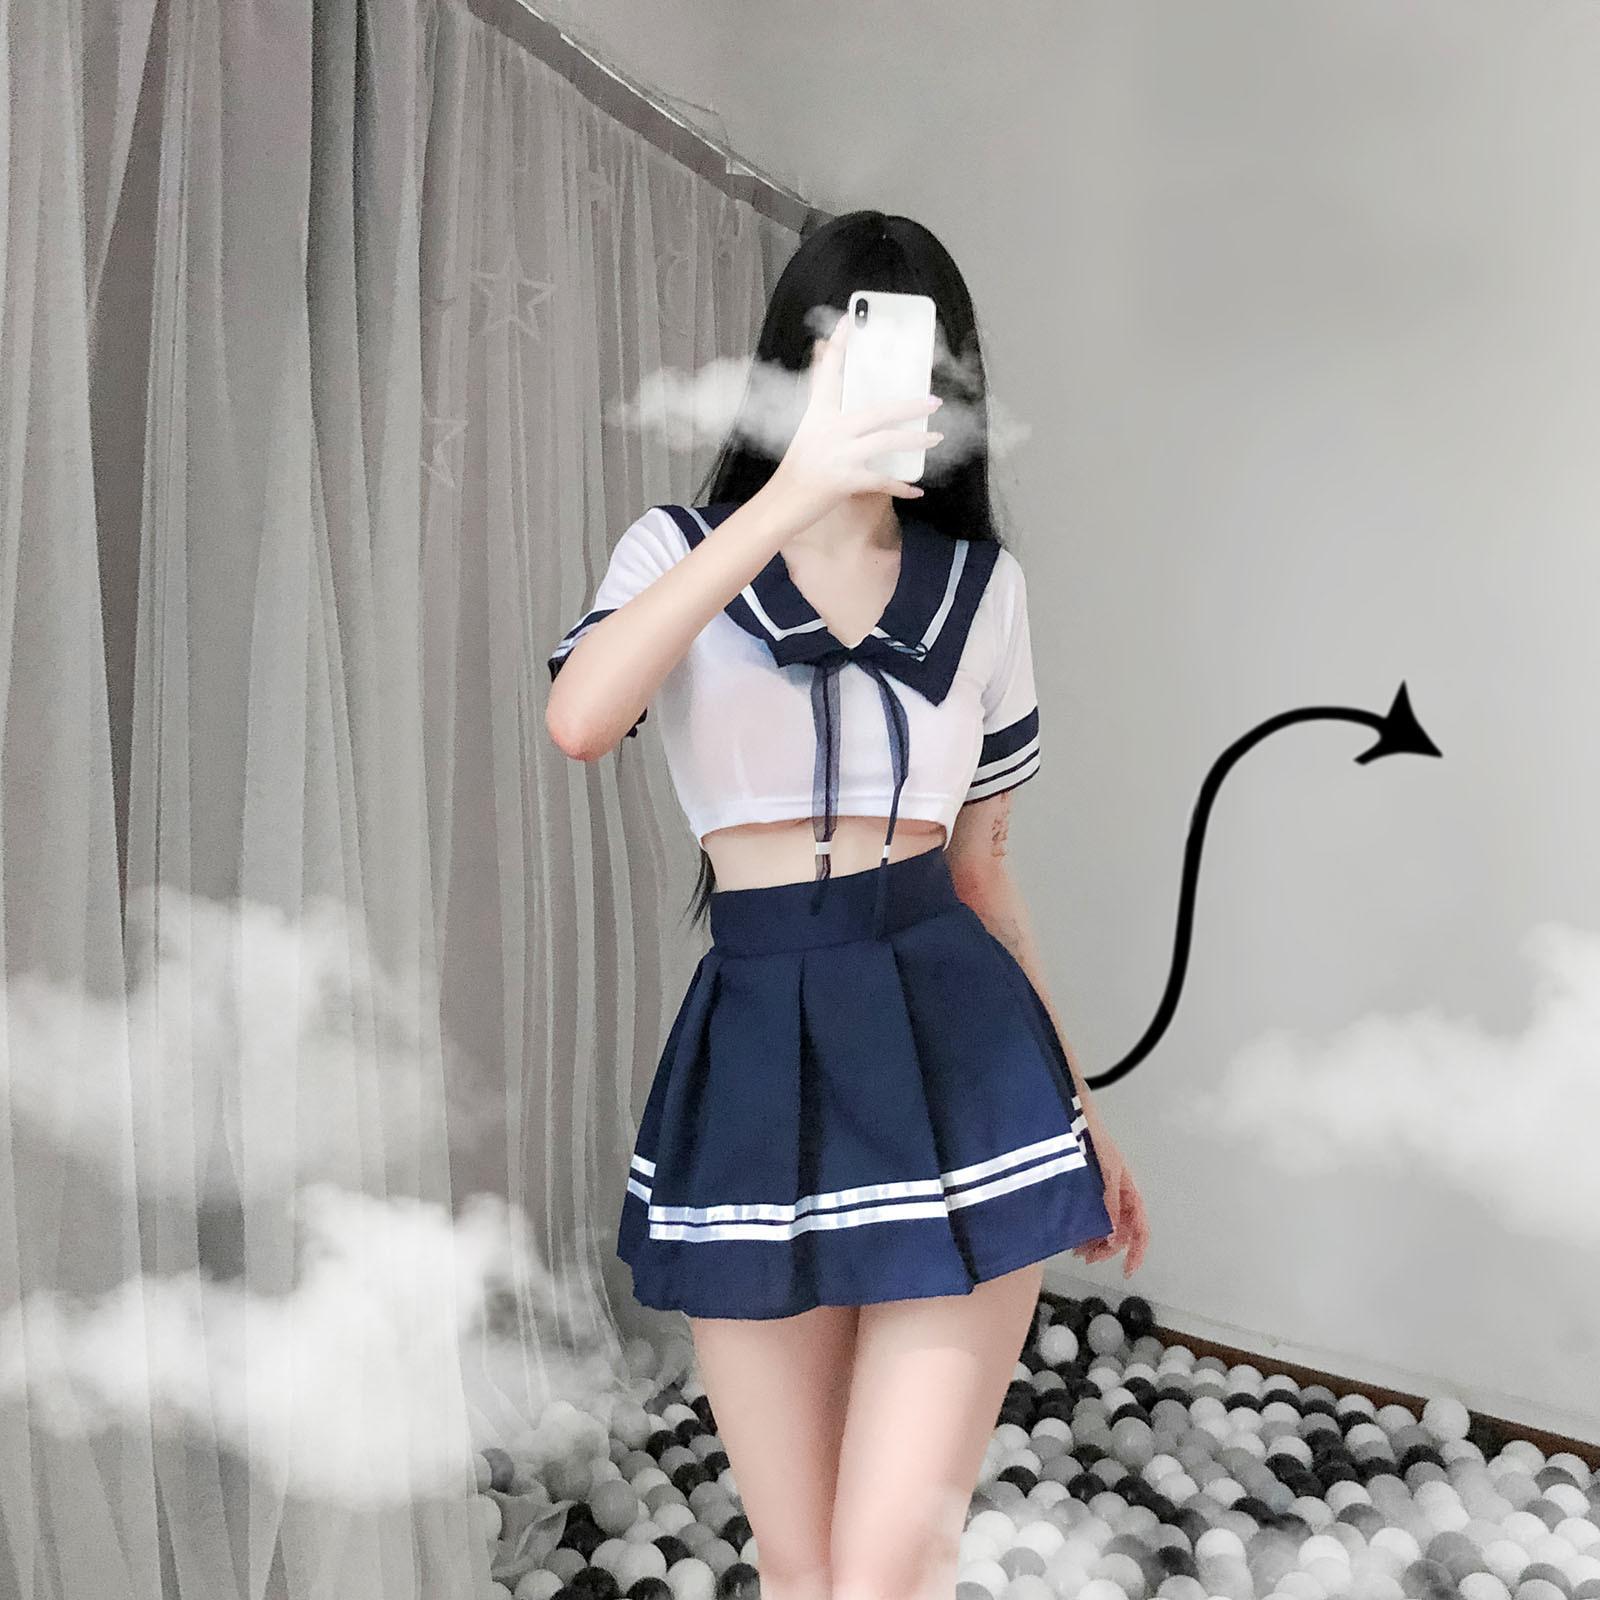 Hot Japanese School Girl photo 9